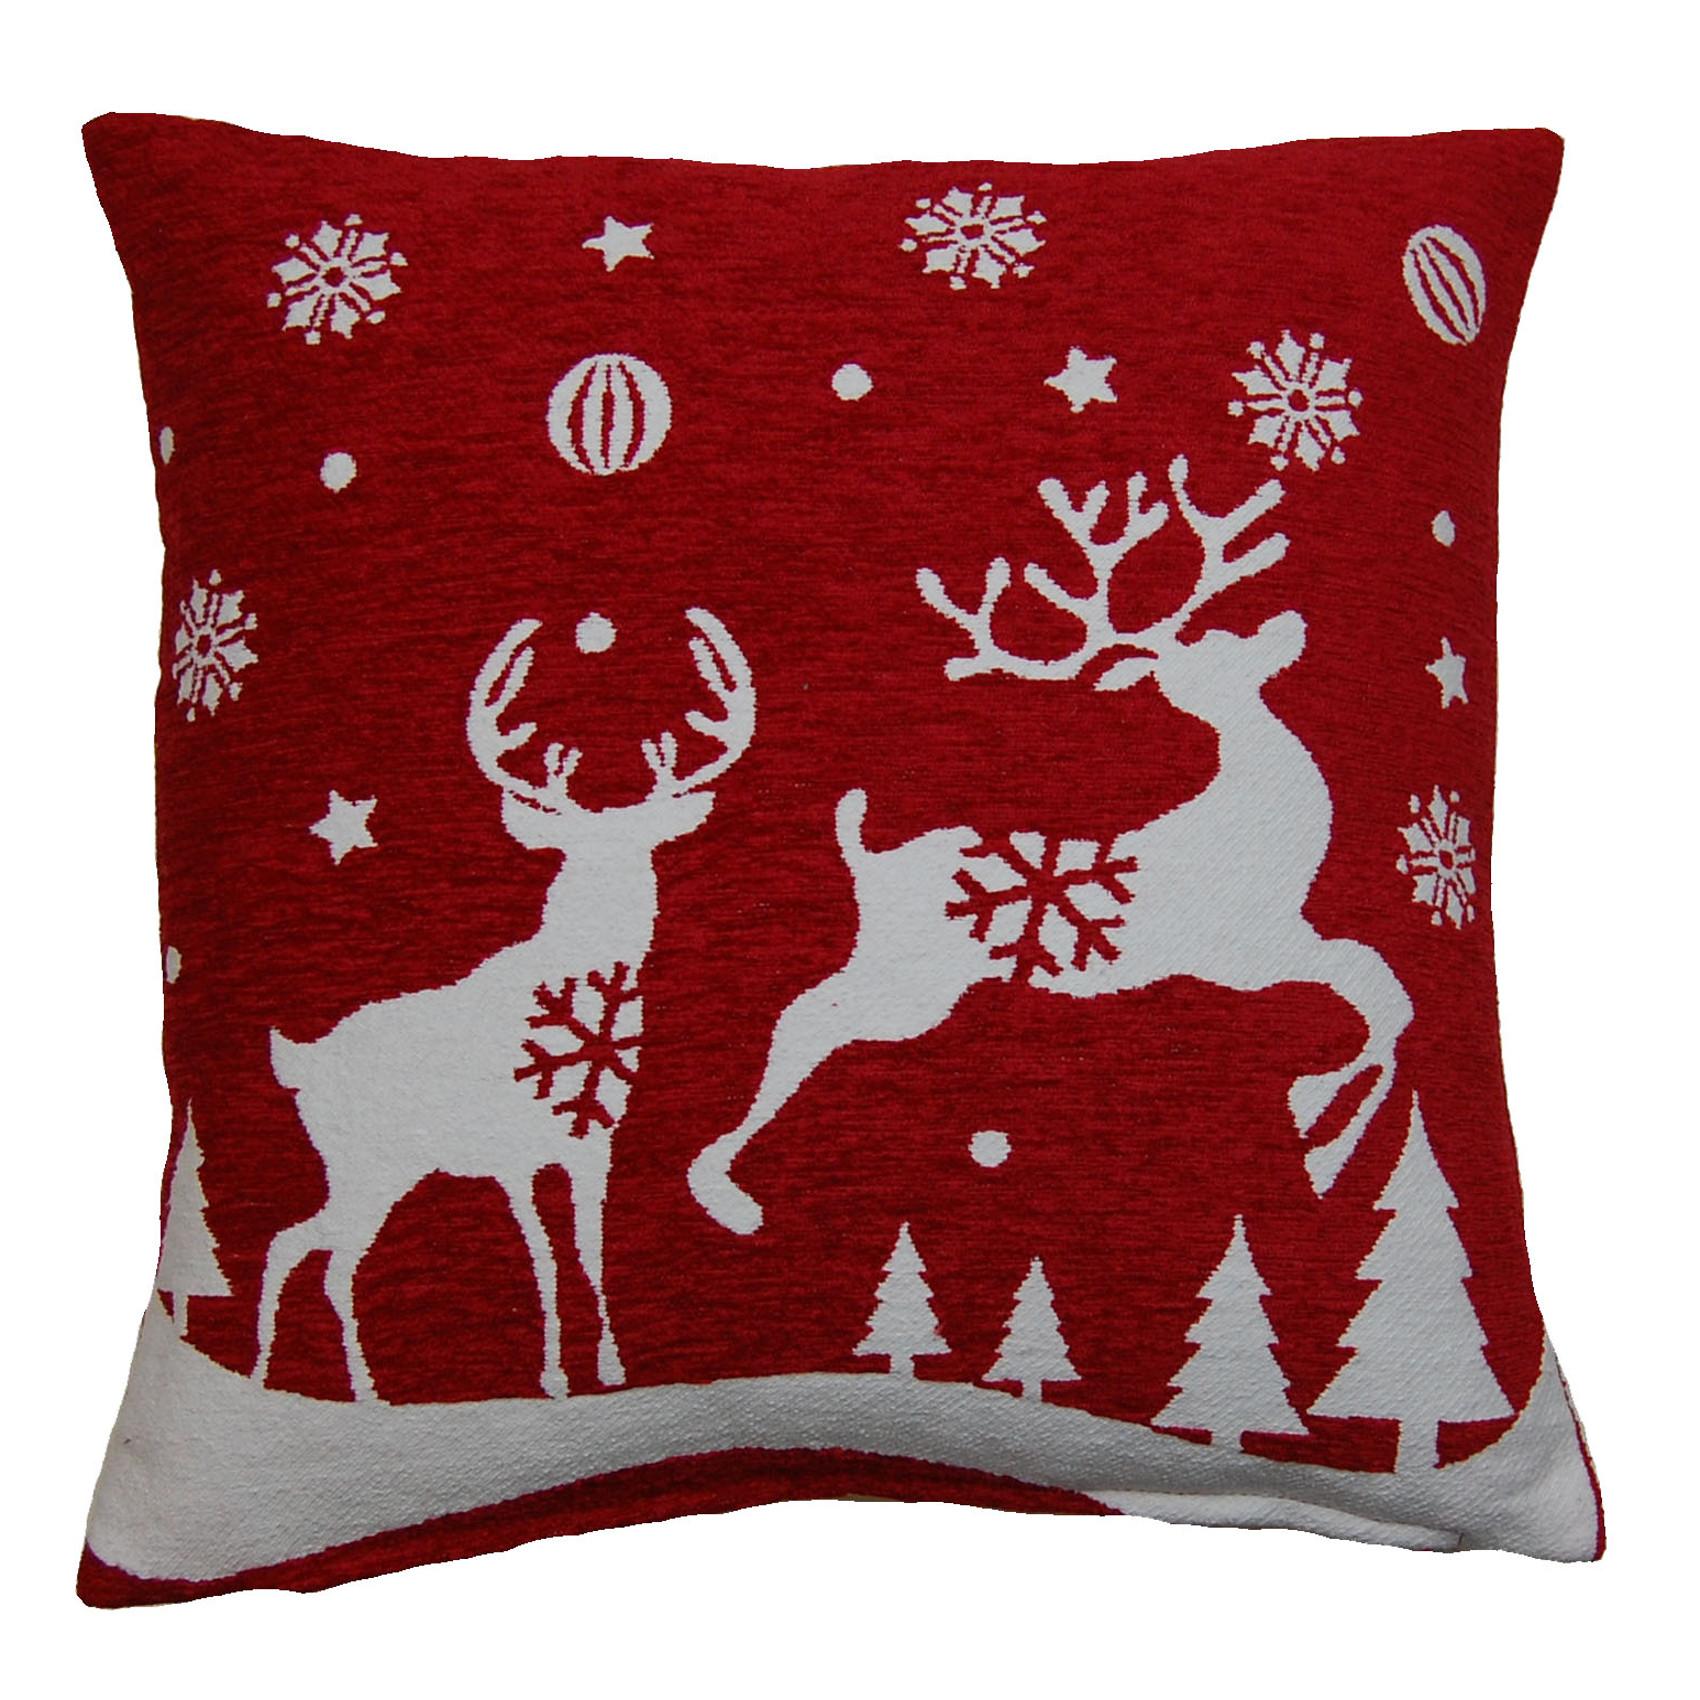 festive christmas cushion covers decorative xmas festive. Black Bedroom Furniture Sets. Home Design Ideas